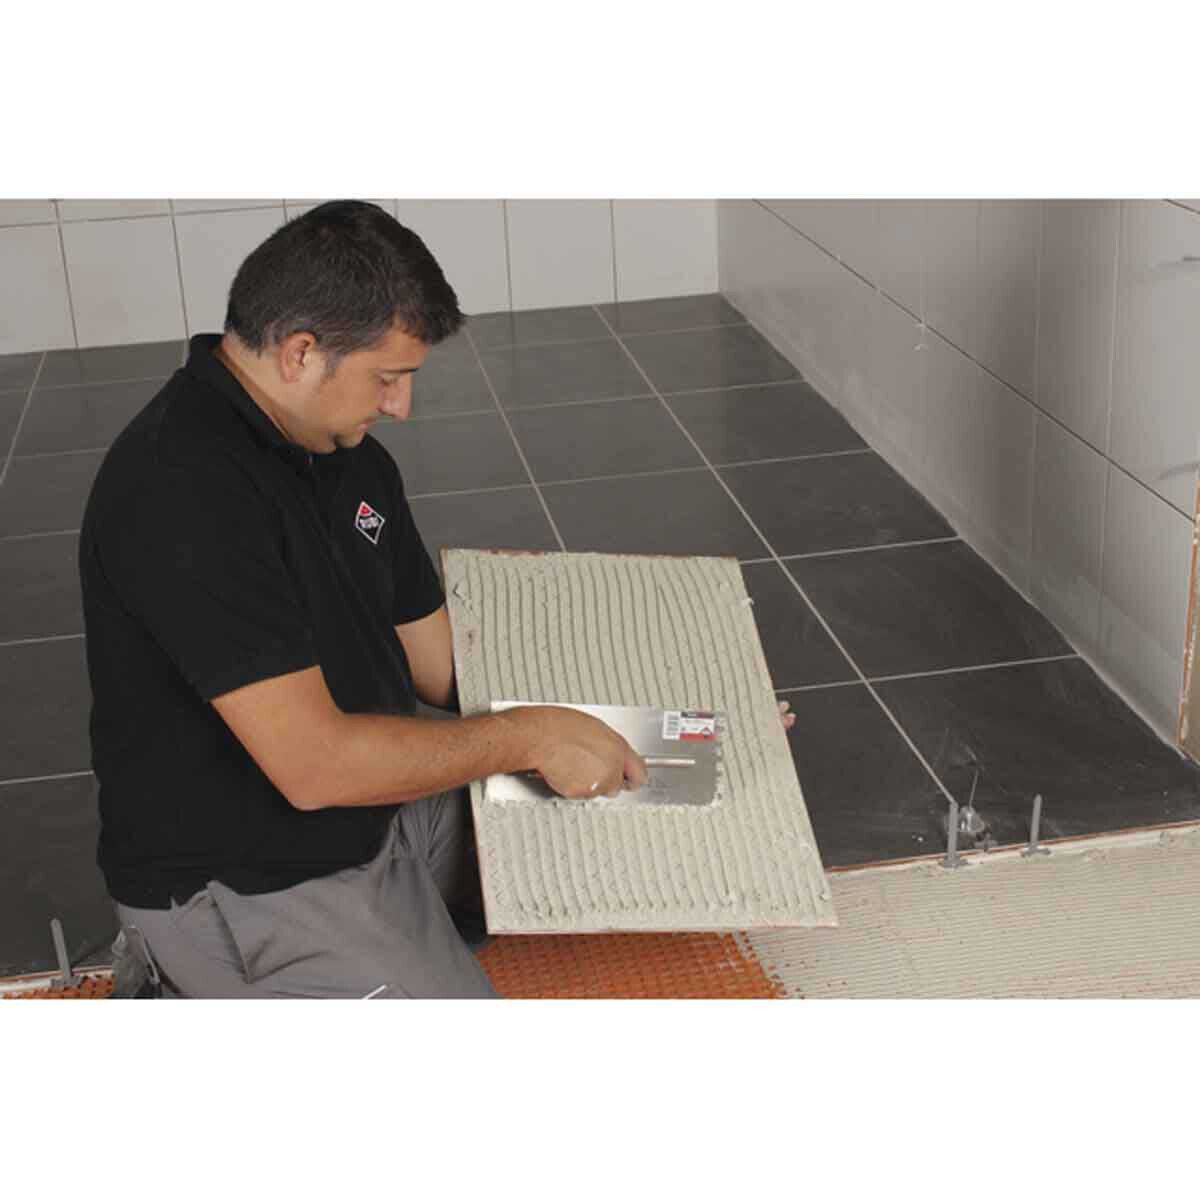 Skim Coating Tile with Rubi Trowels